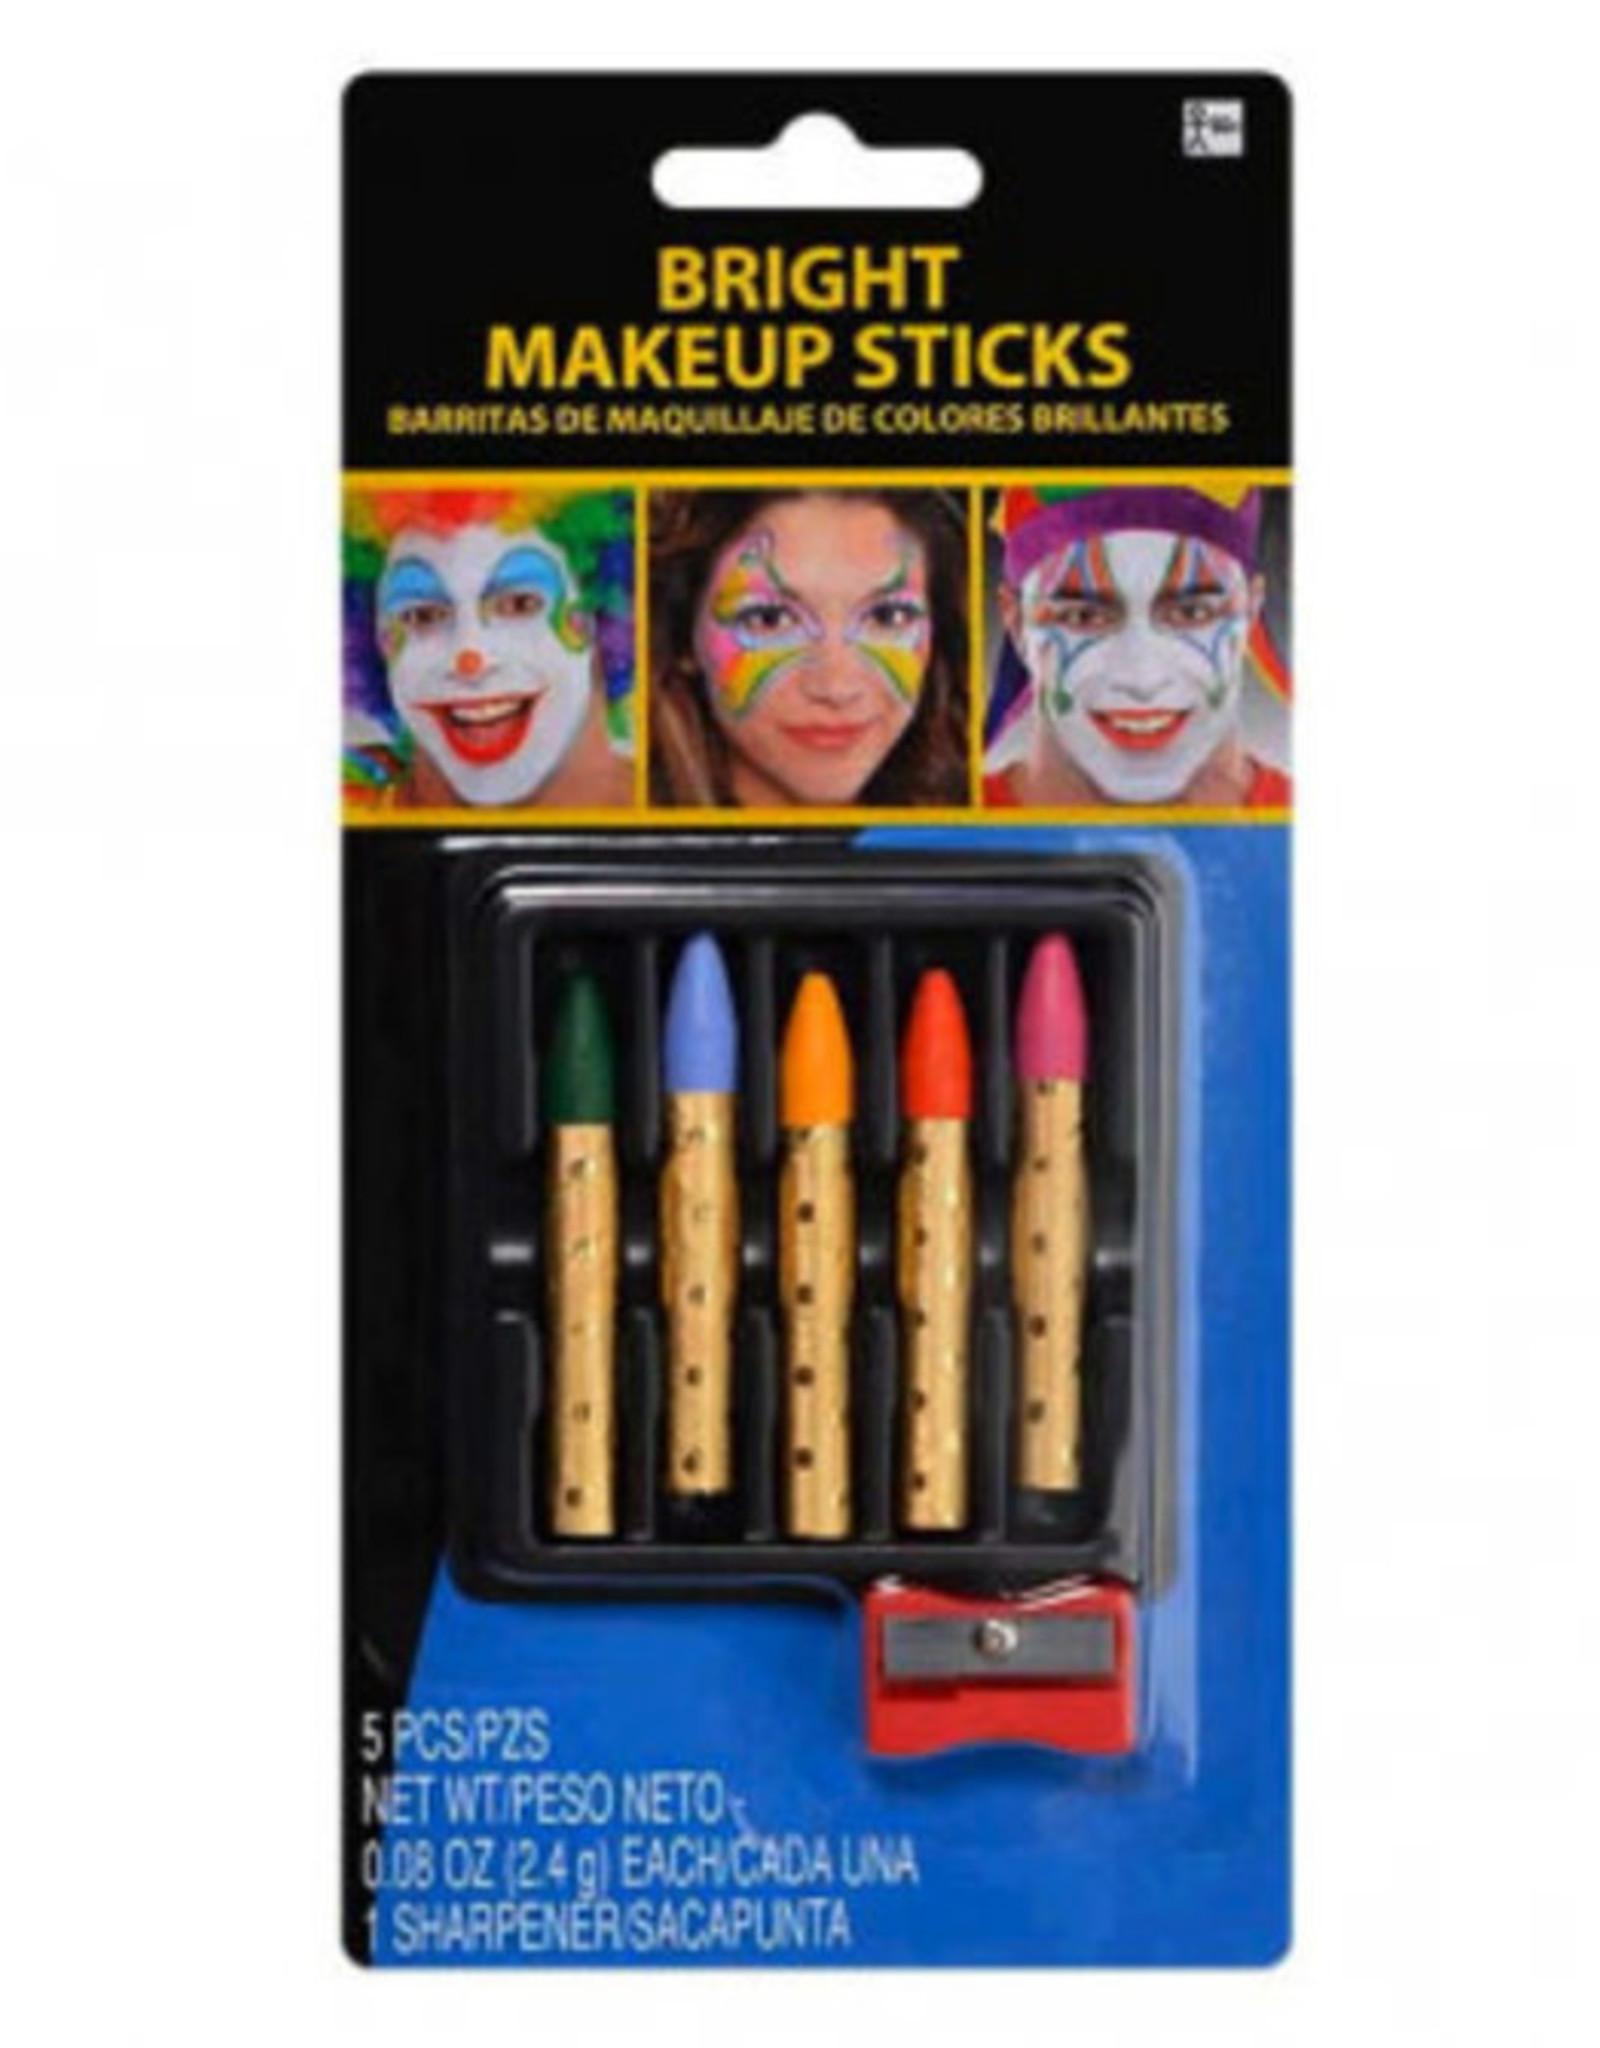 Bright Makeup Sticks